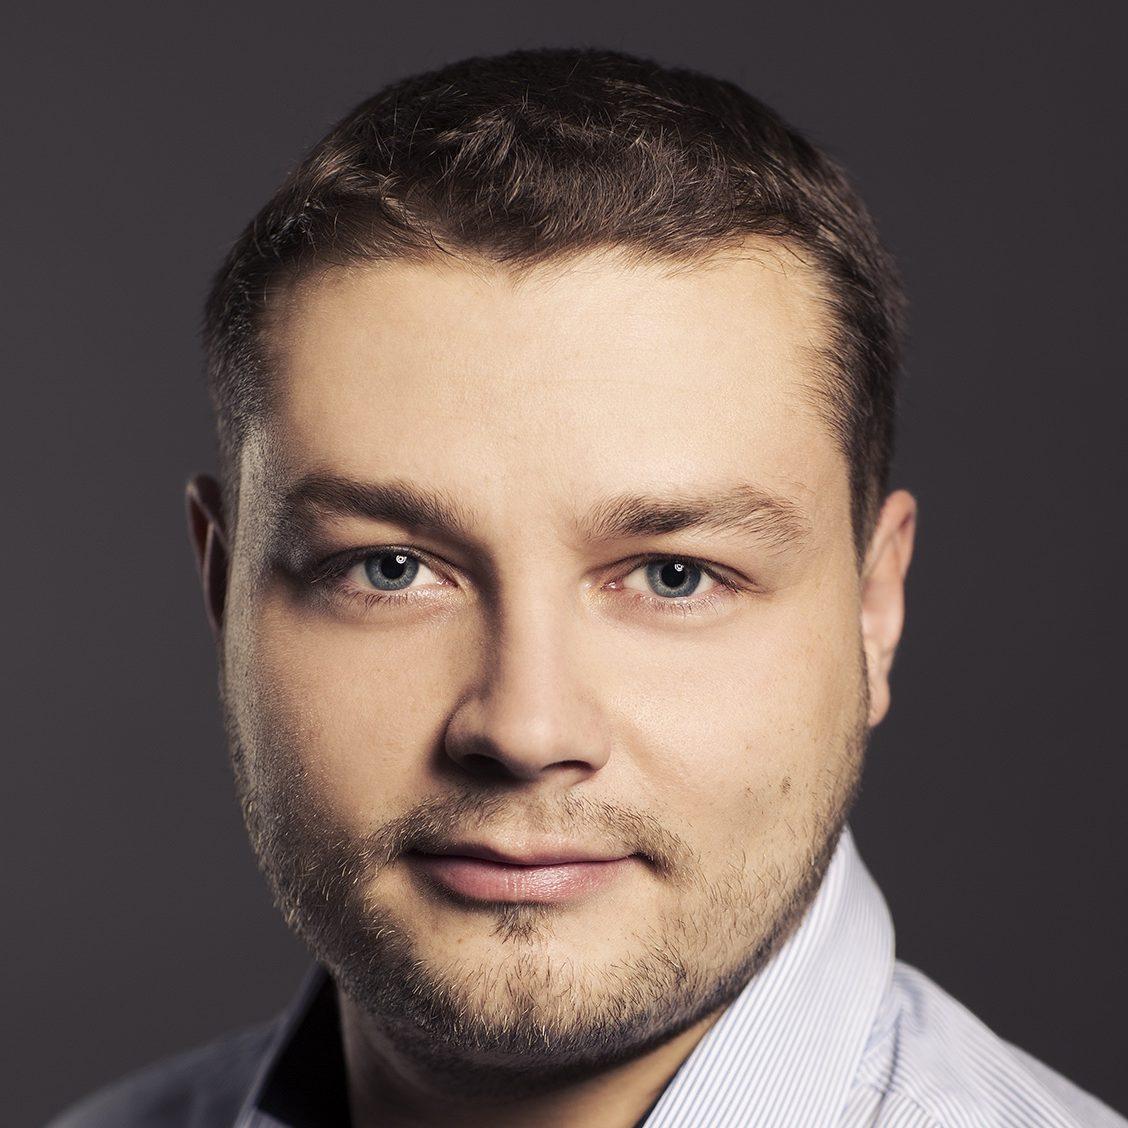 Tomáš Hanus